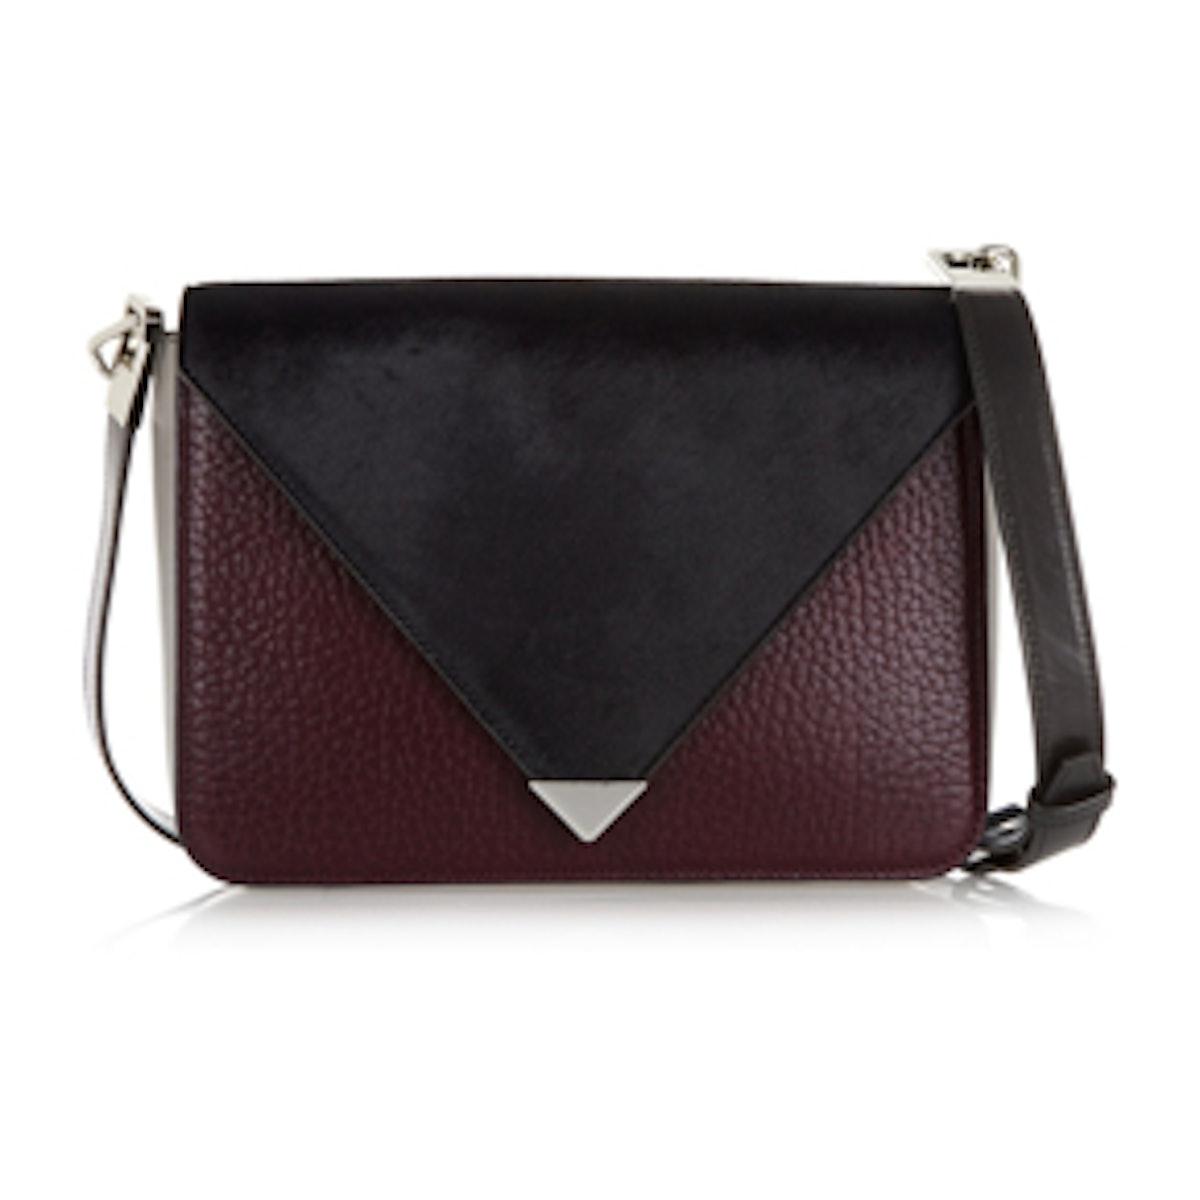 Prisma Leather And Calf Hair Shoulder Bag